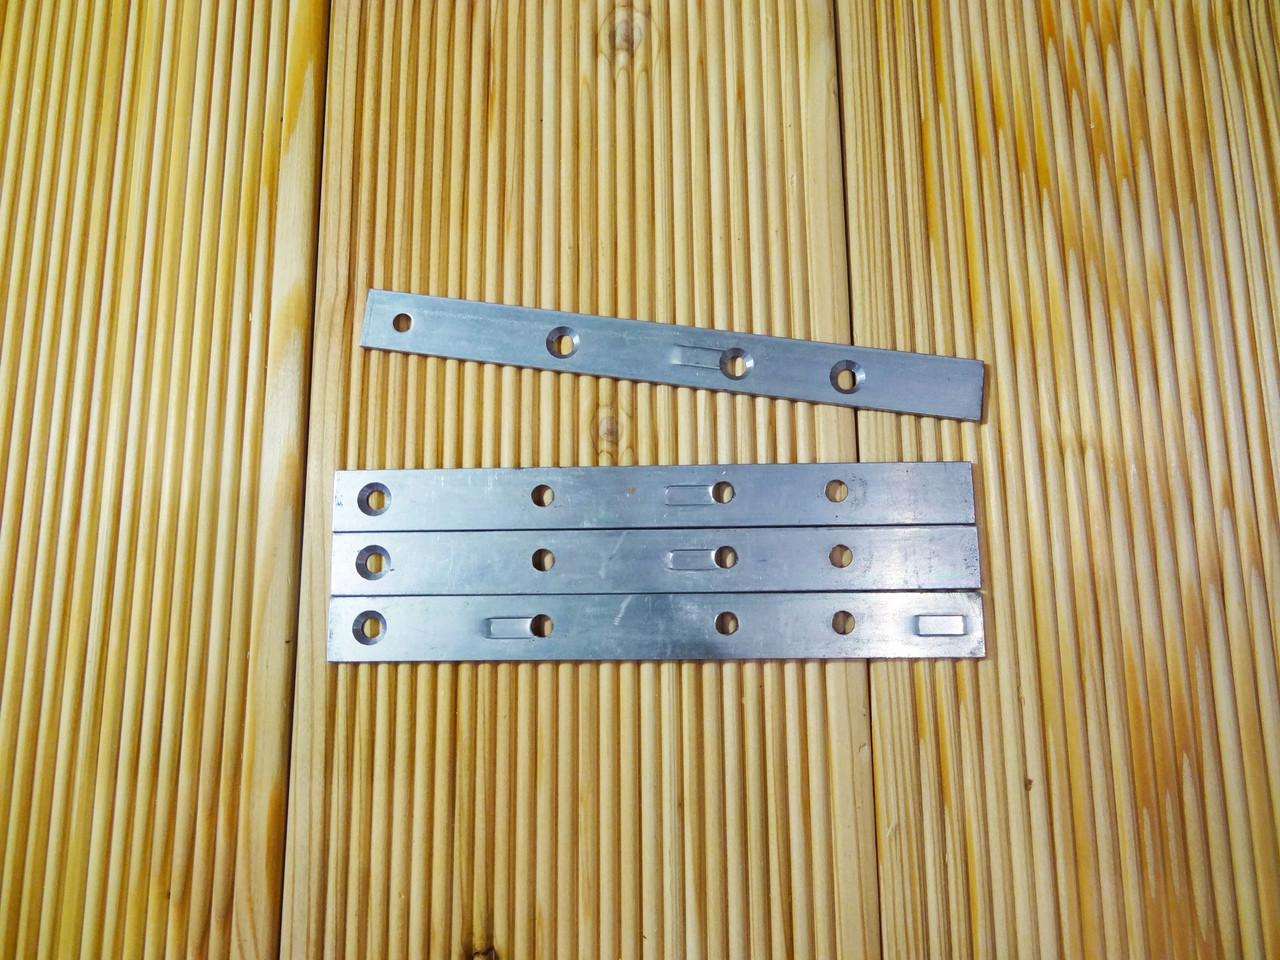 Пластина скрытого монтажа, Крепеж для фасада, террасы, палубы, планкена 160х15 без стопора